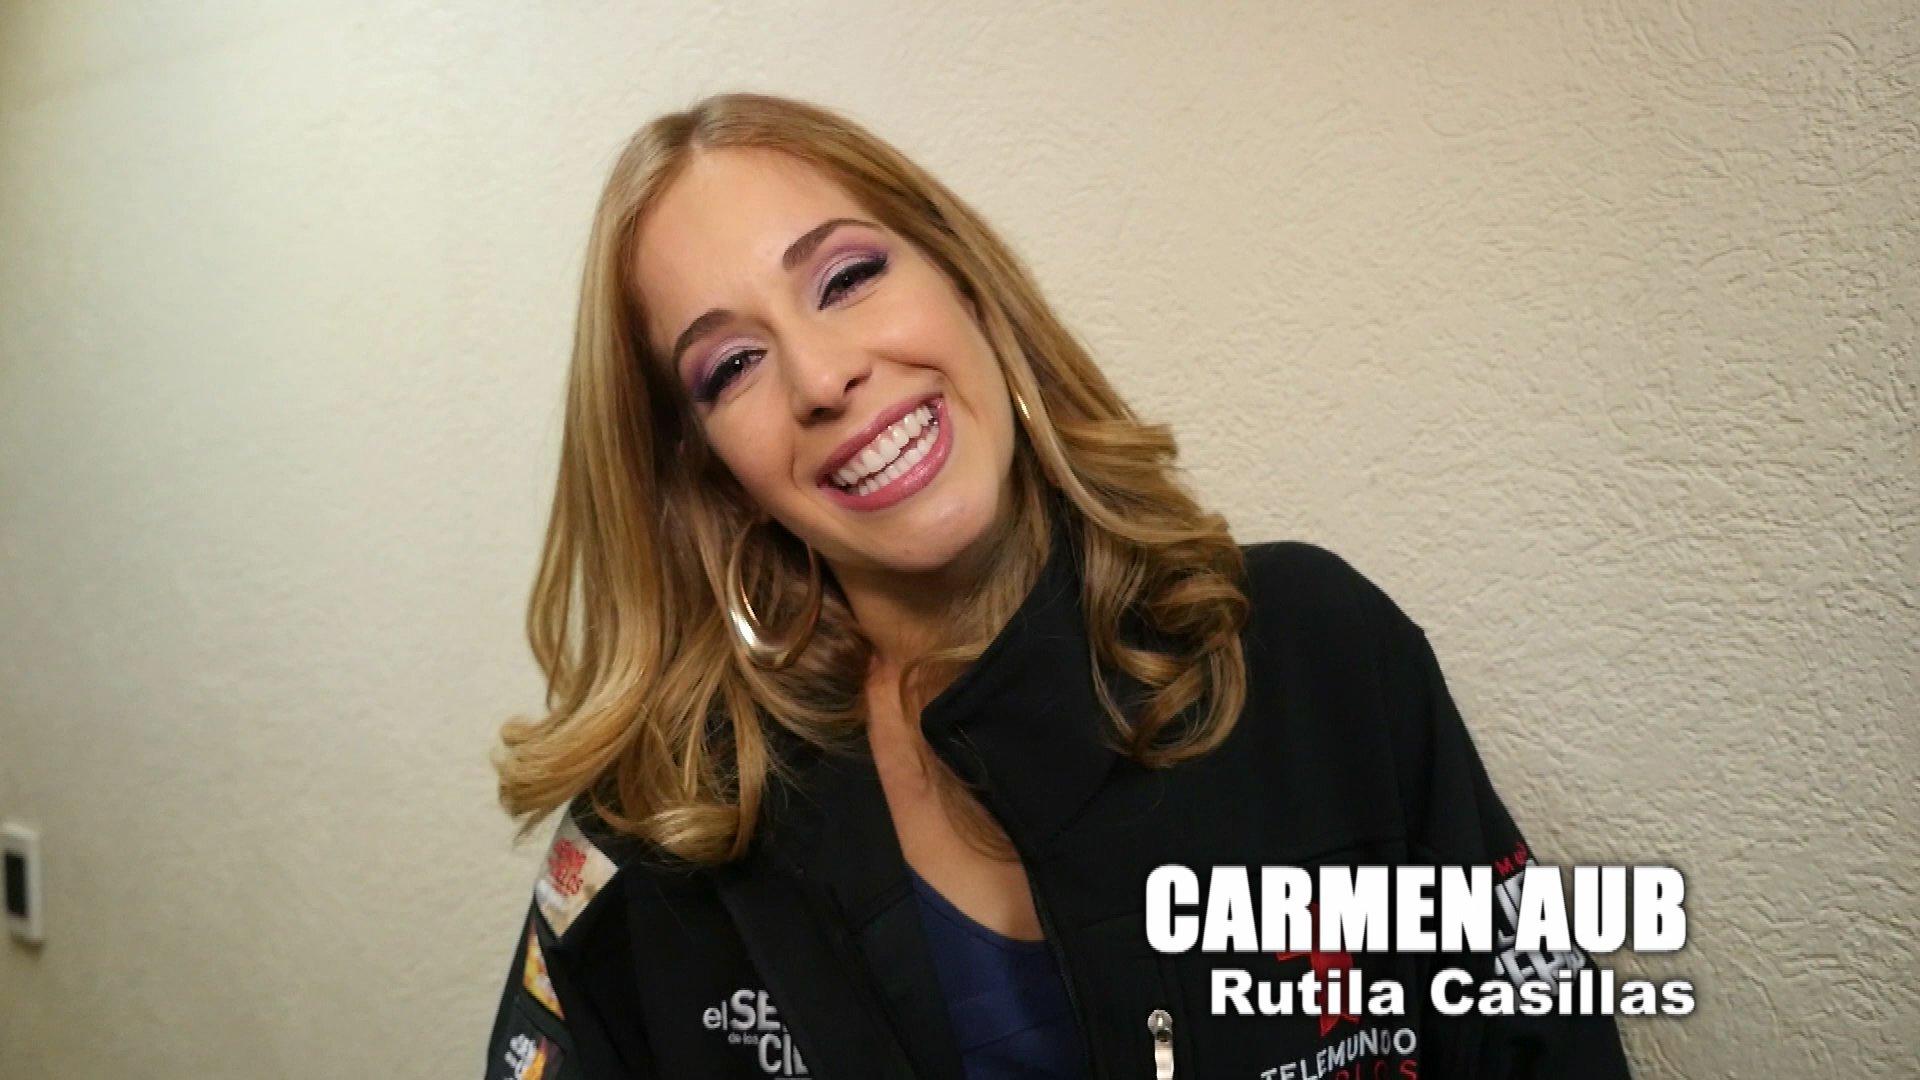 Carmen aub dating list